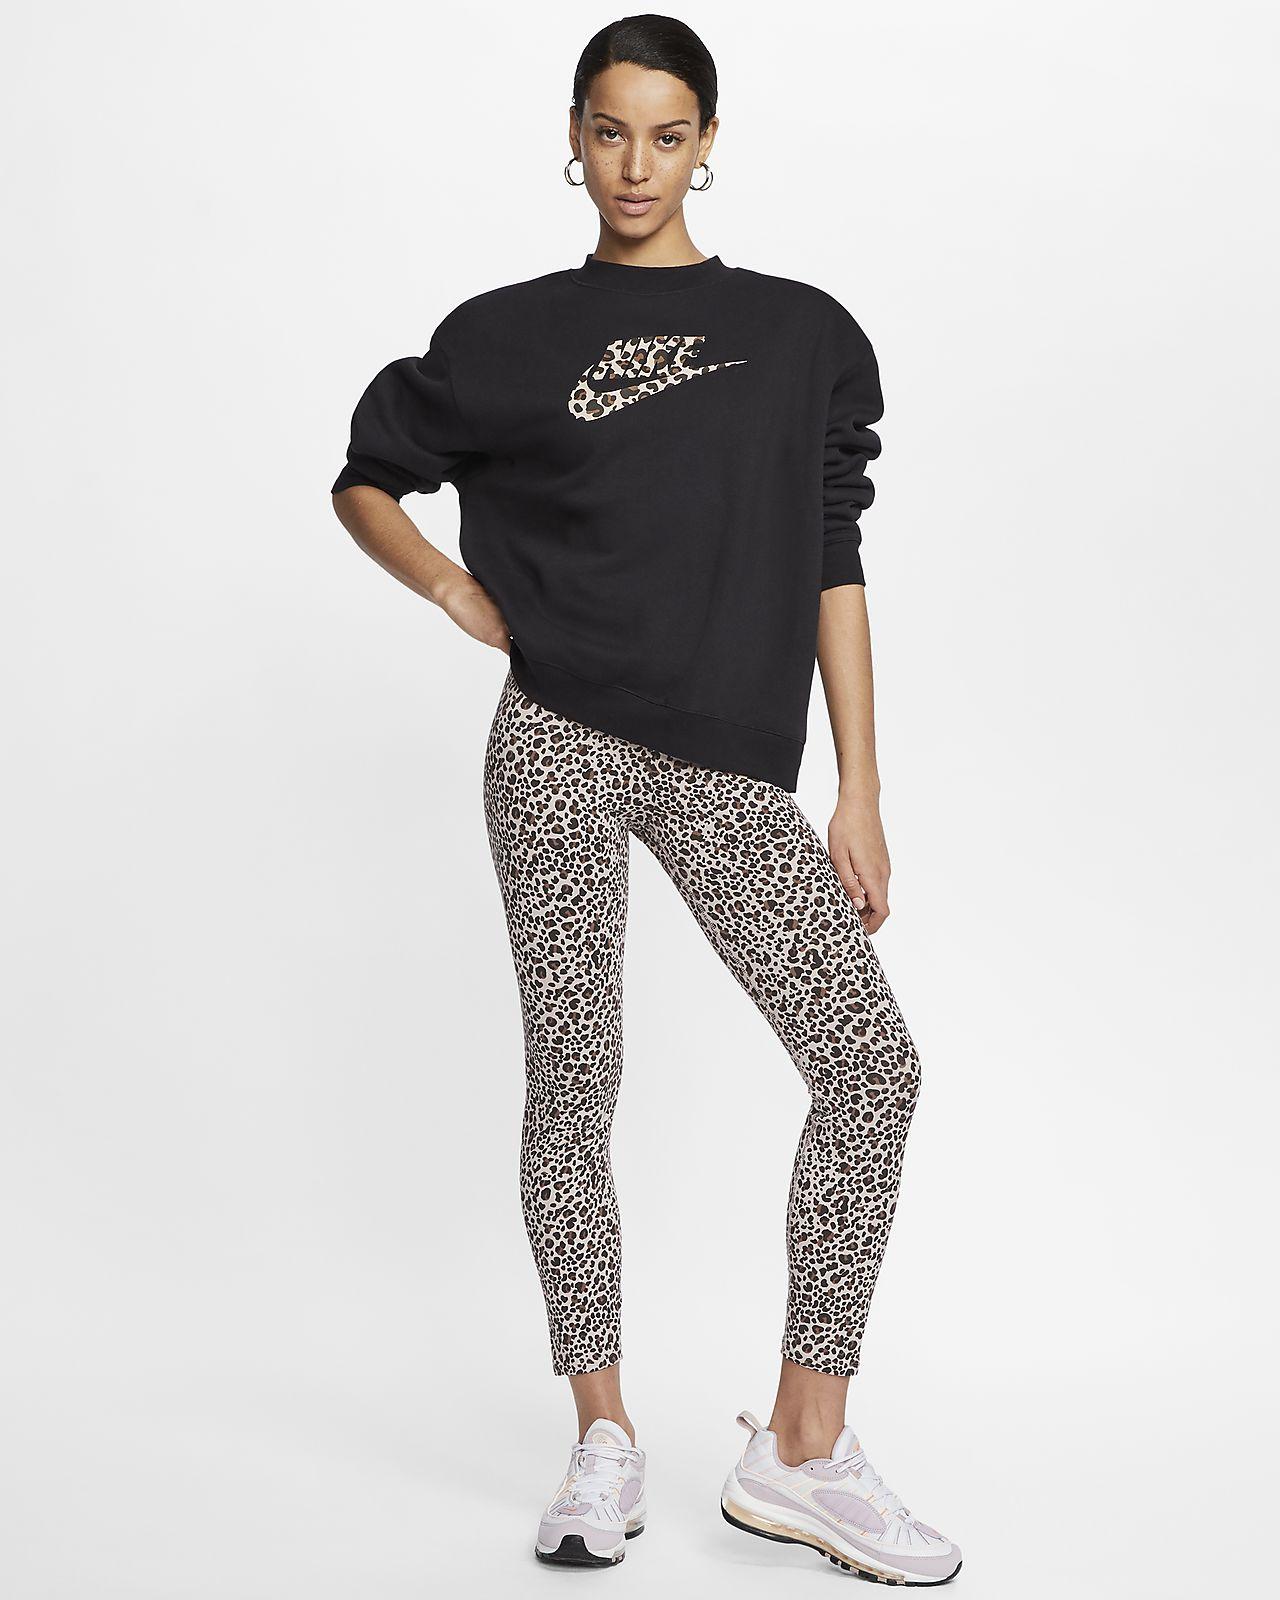 Nike Sportswear Women's Animal Print Leggings